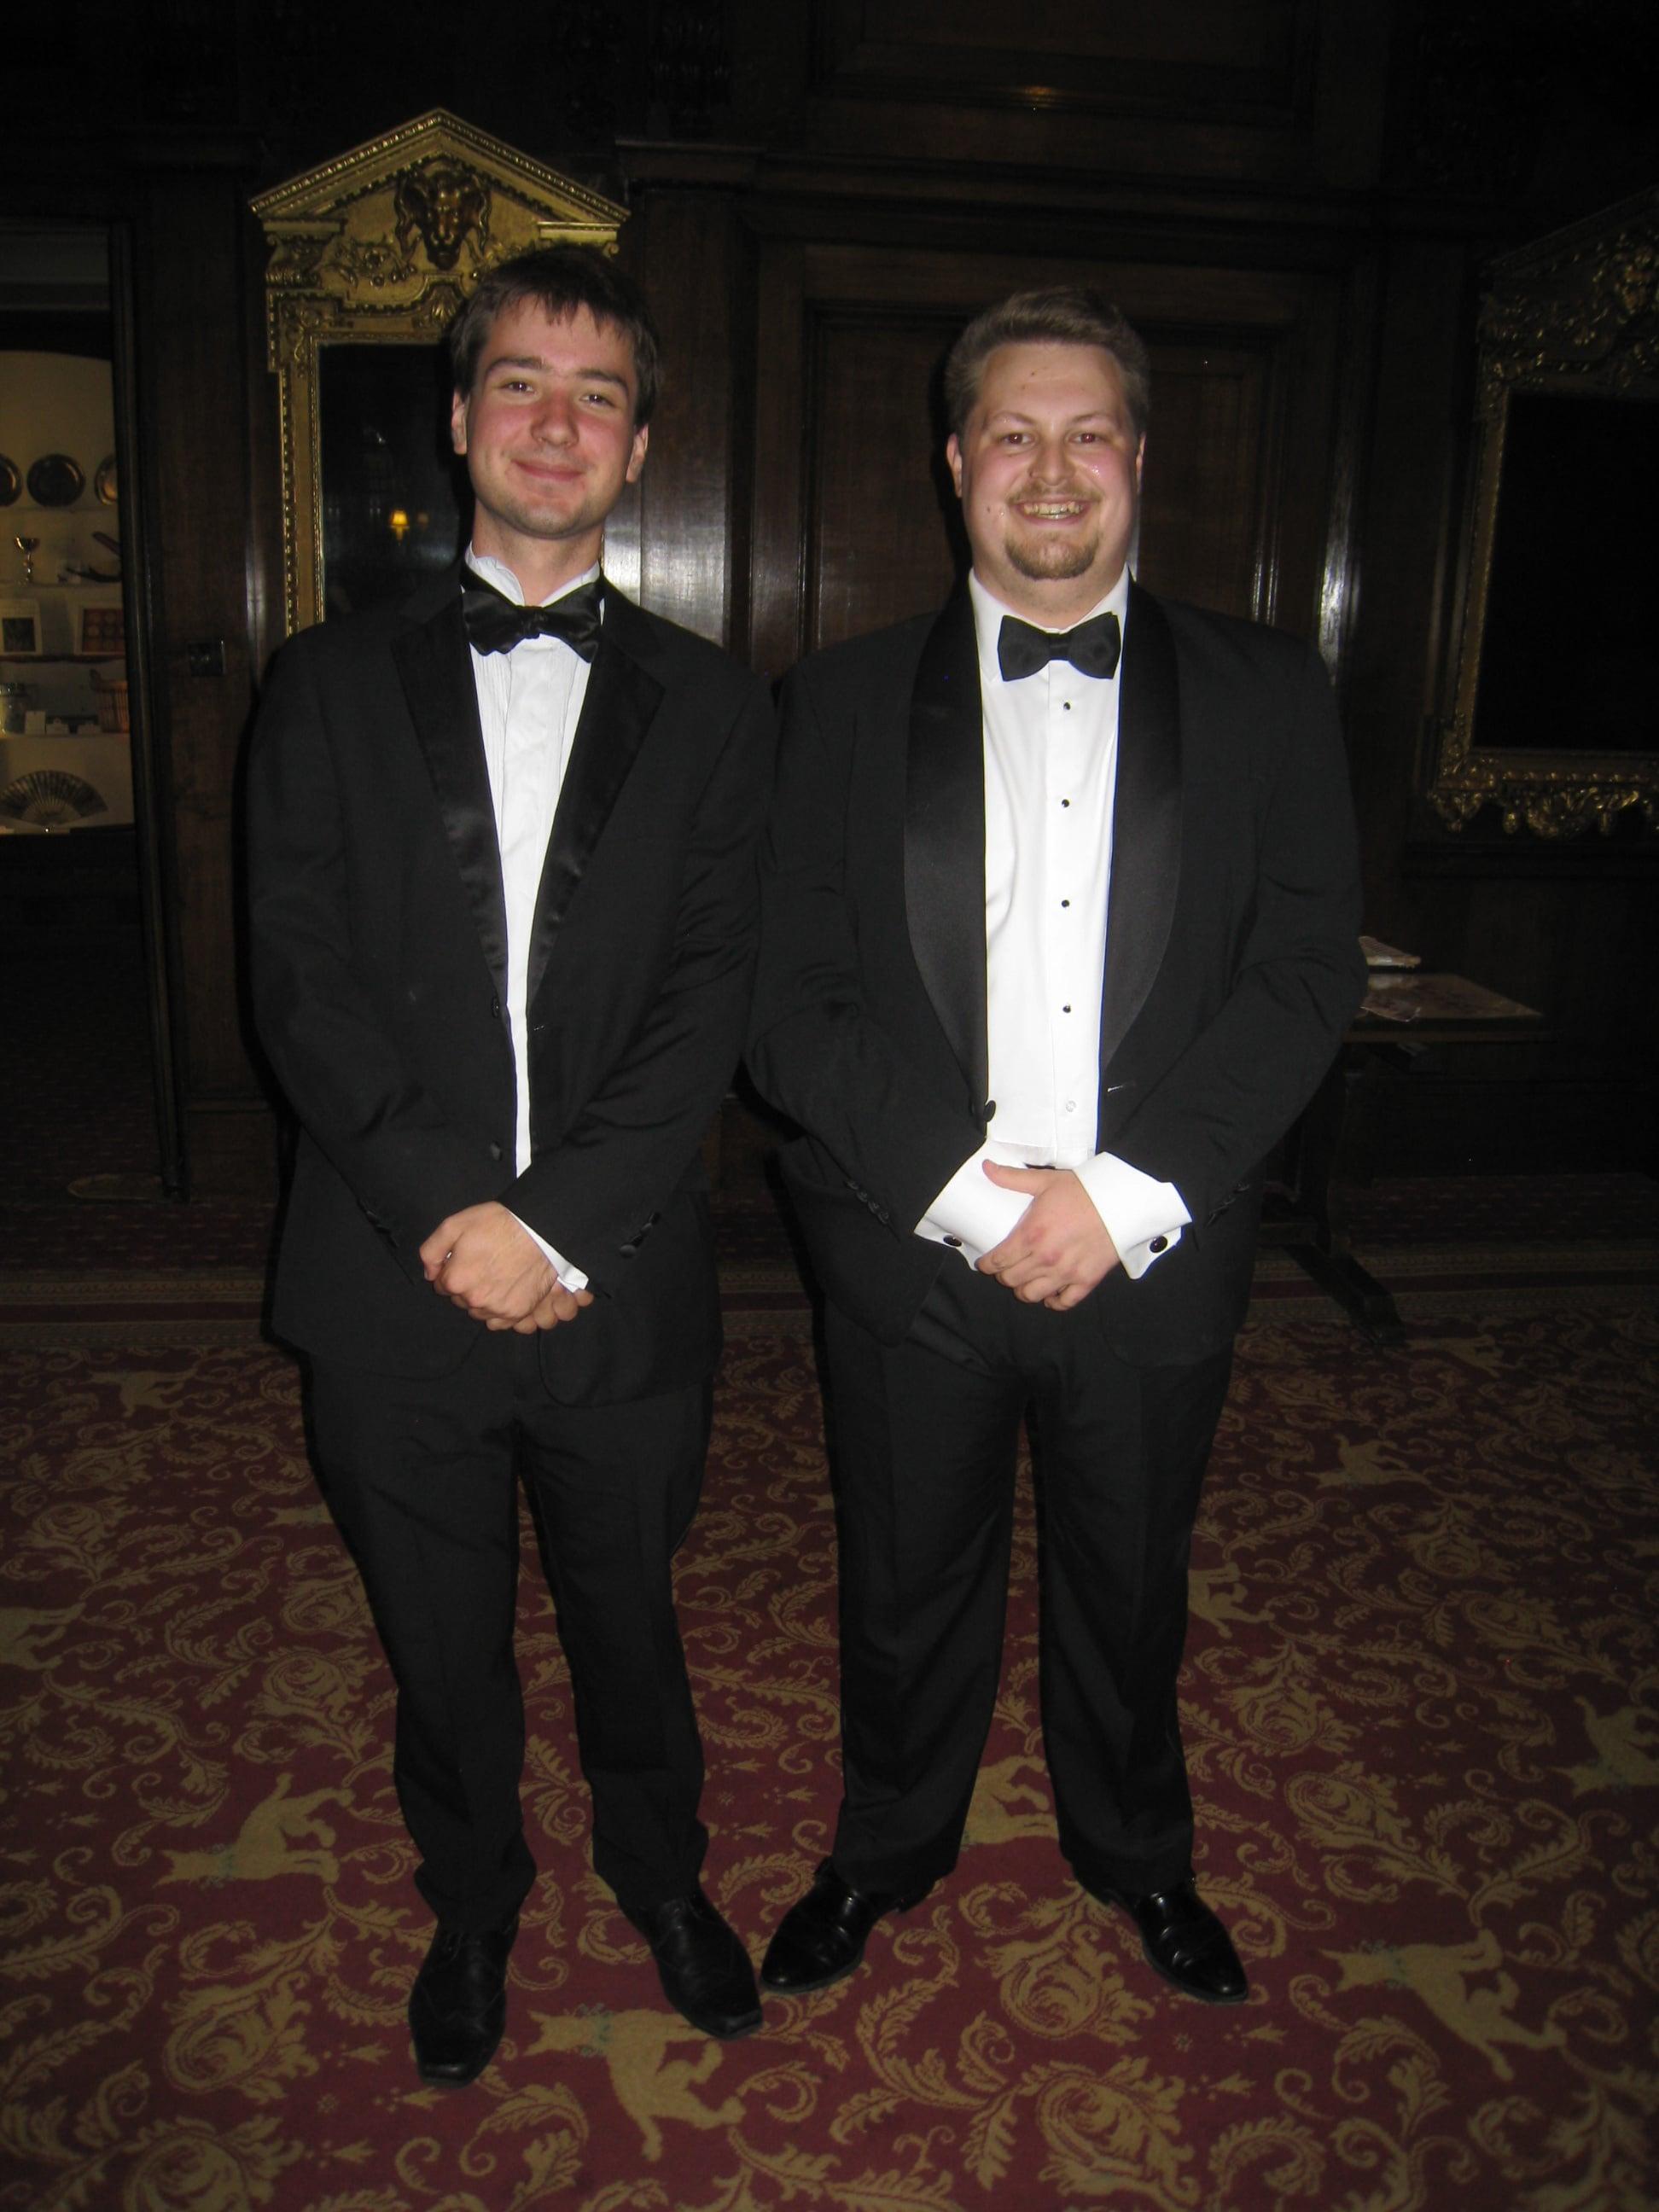 Pianist Edward Whitehead / GSM Bursary Student David Ireland